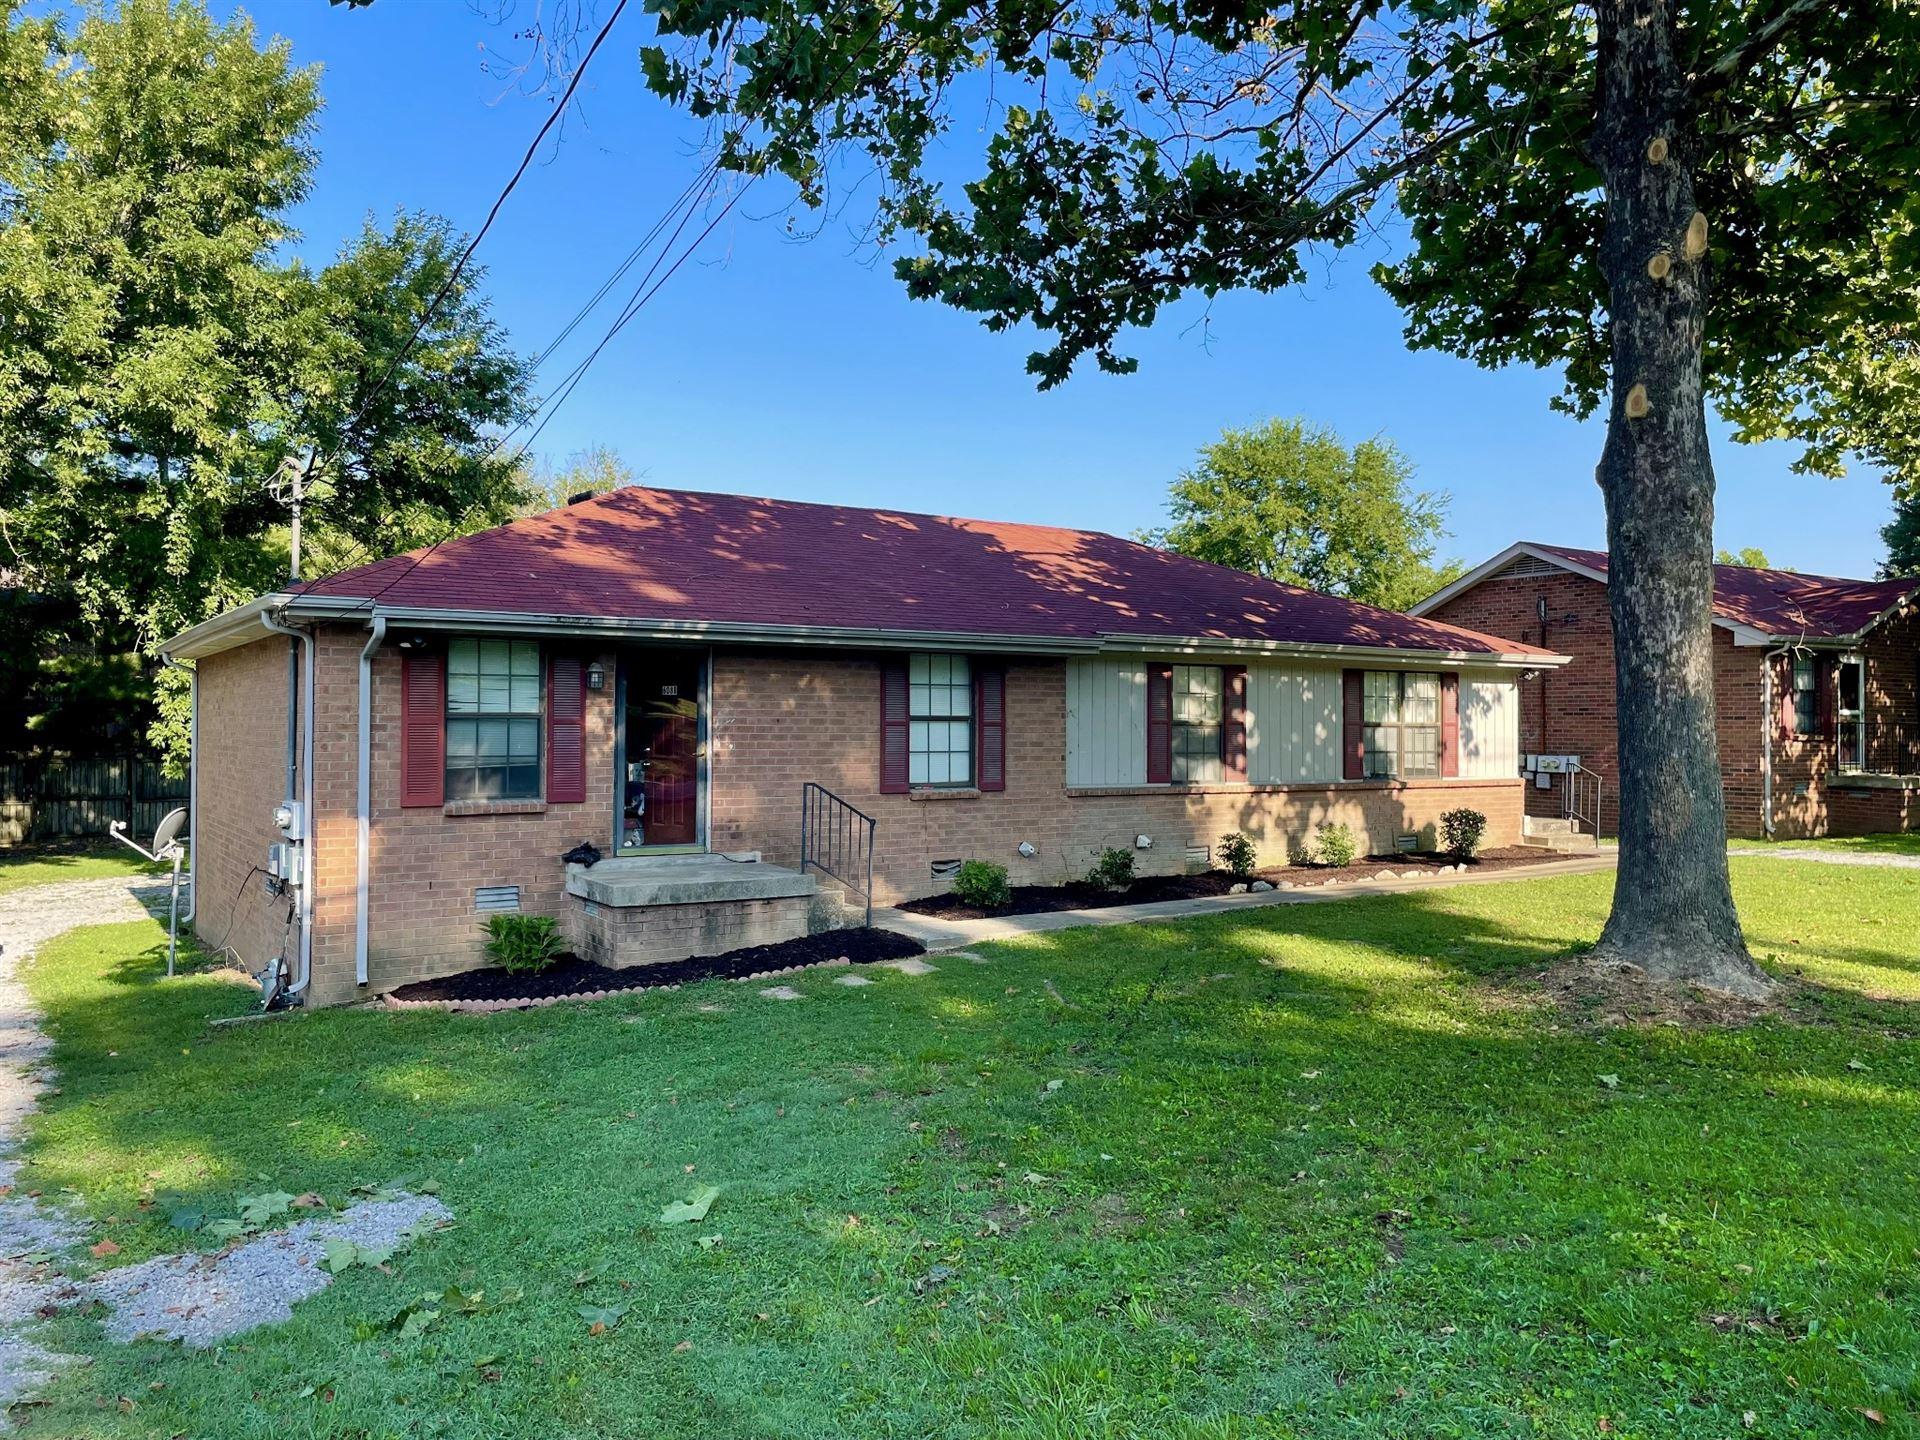 608 Tulip Grove Rd, Hermitage, TN 37076 - MLS#: 2273606